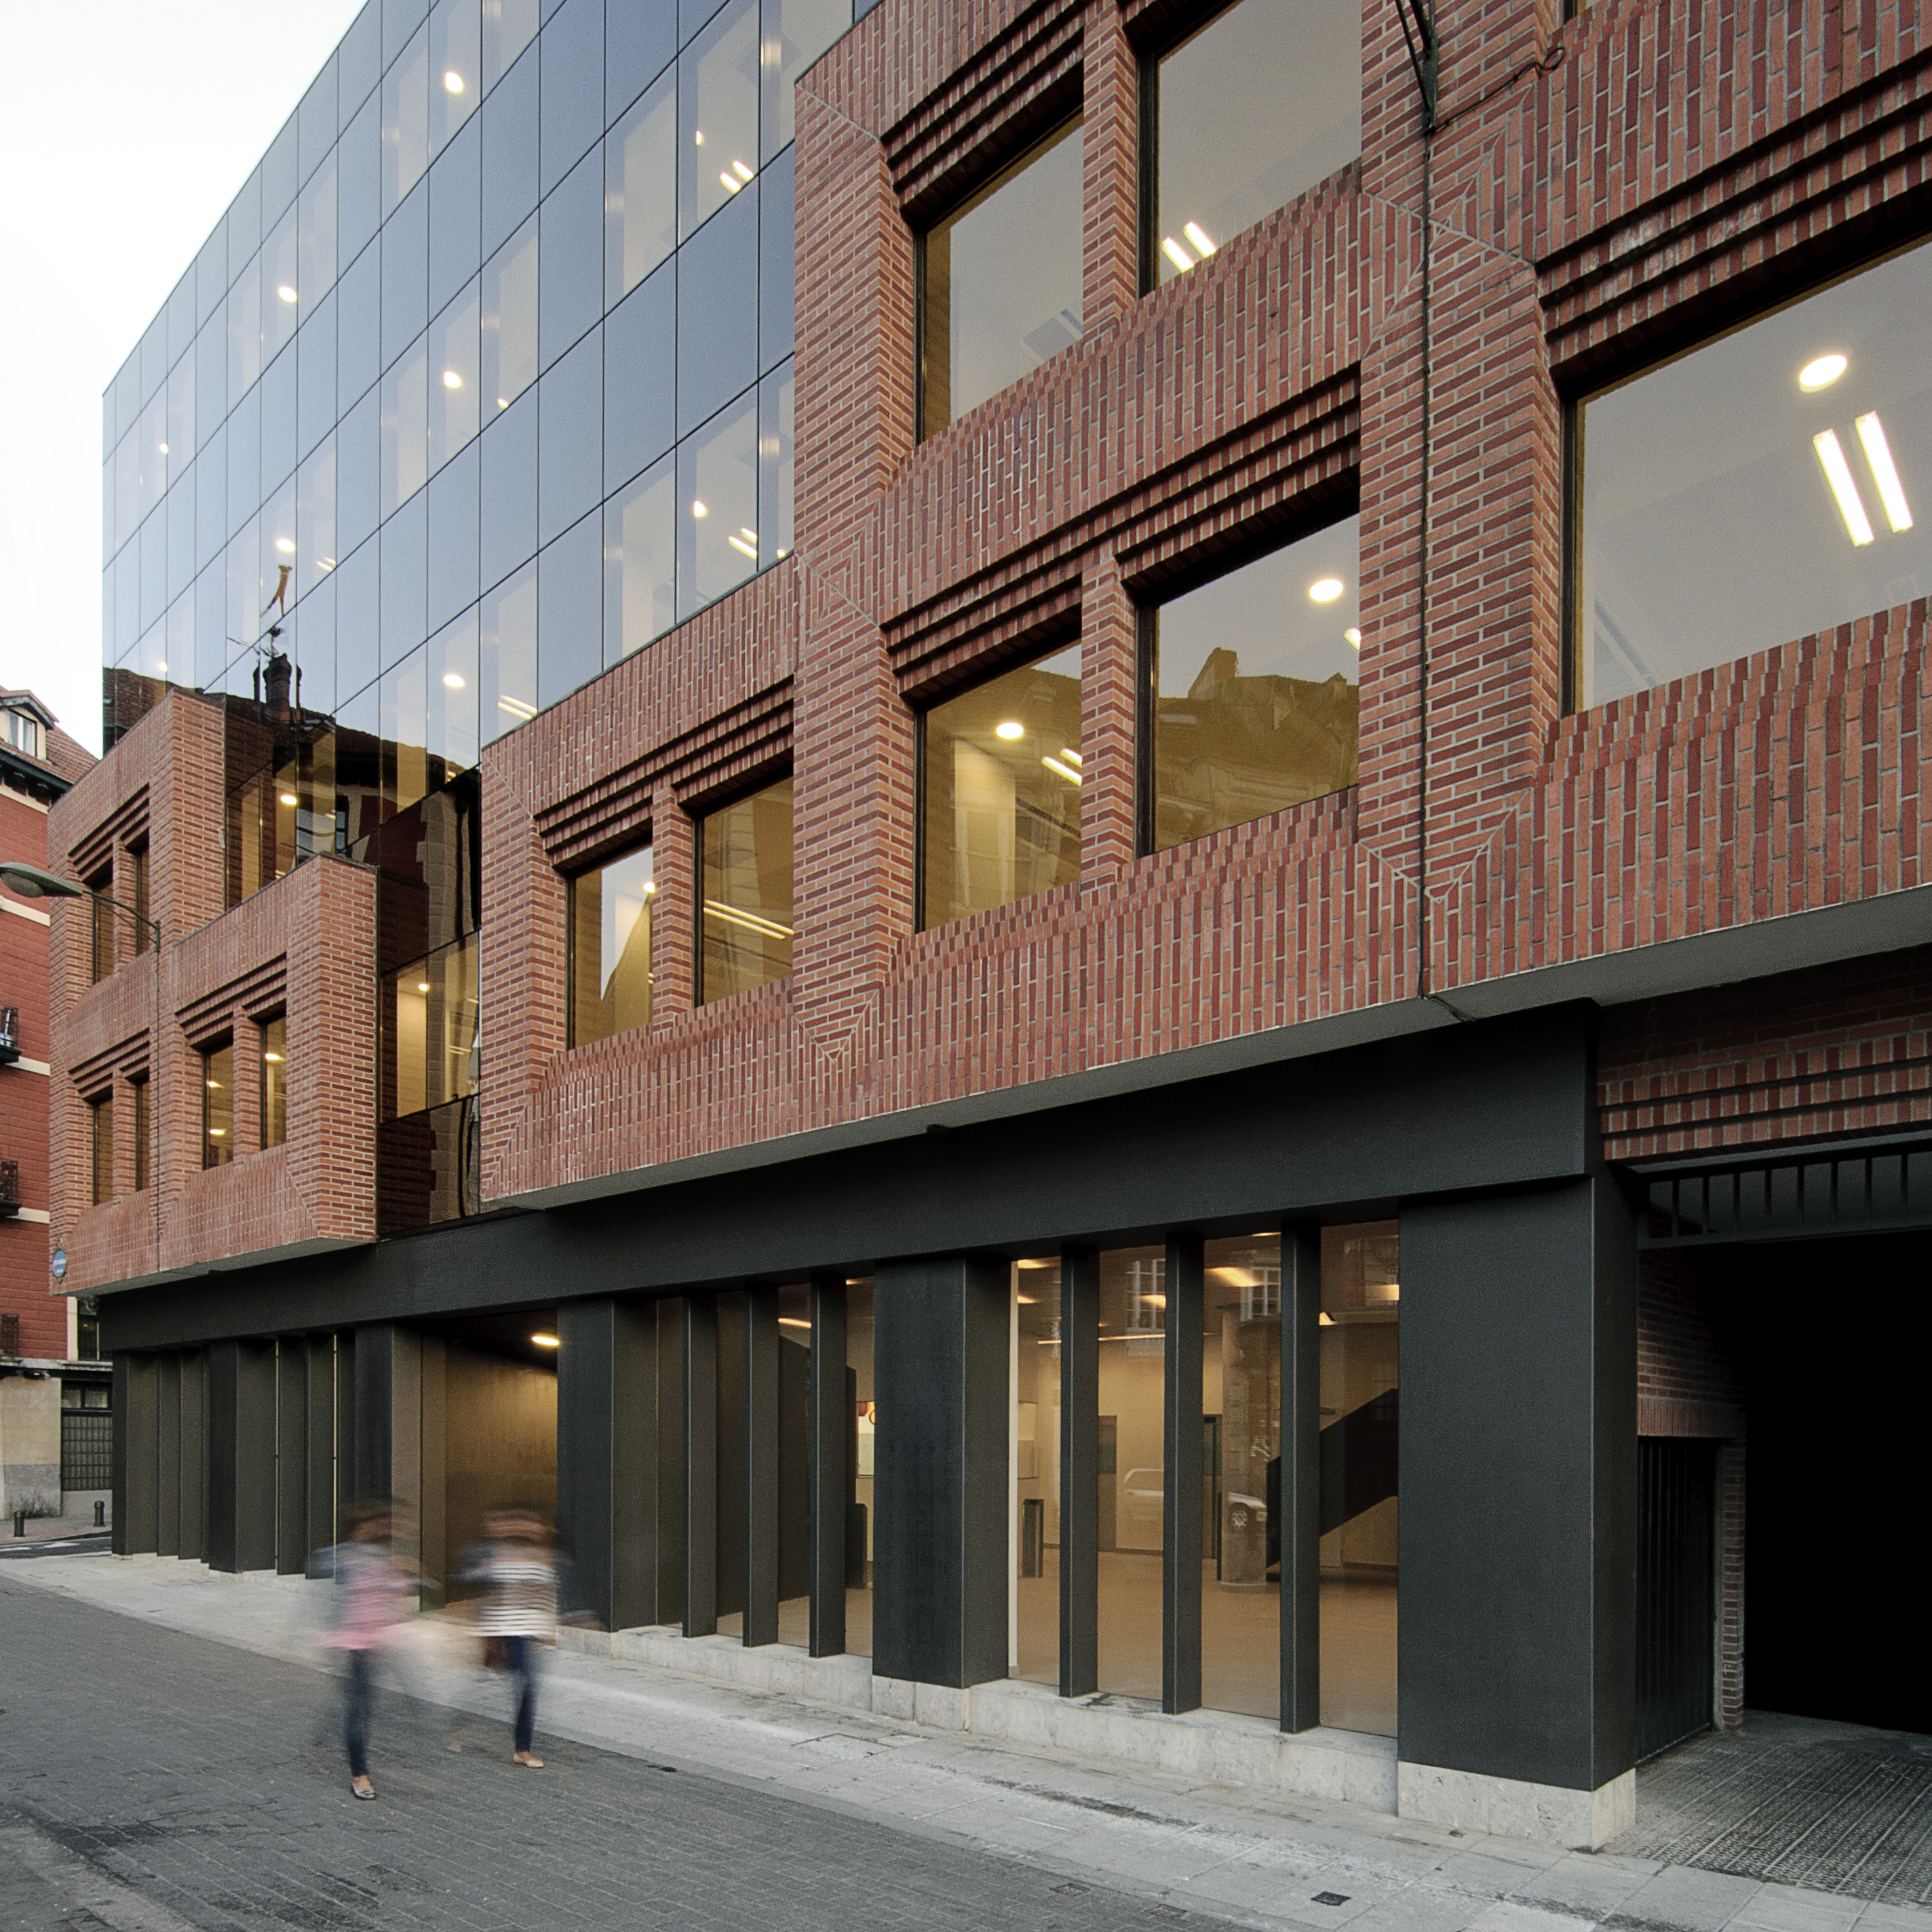 Garmendia cordero arquitectos reforma de edificio de oficinas en bilbao hic arquitectura - Edificio de oficinas ...